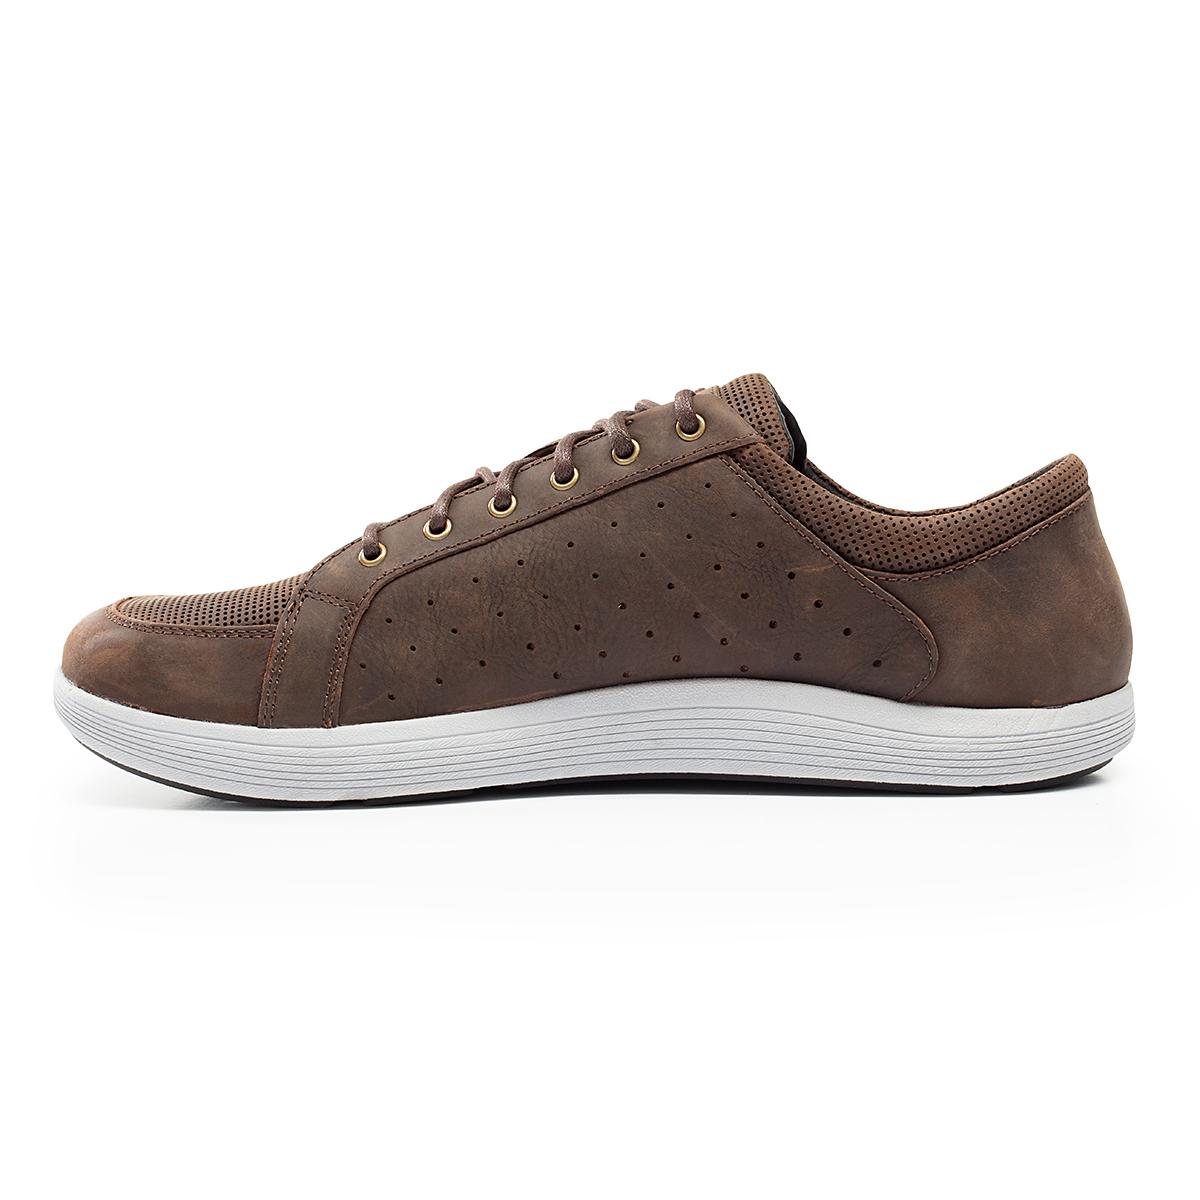 Men's Altra Cayd Lifestyle Shoe - Color: Brown (Regular Width) - Size: 10, Brown, large, image 2